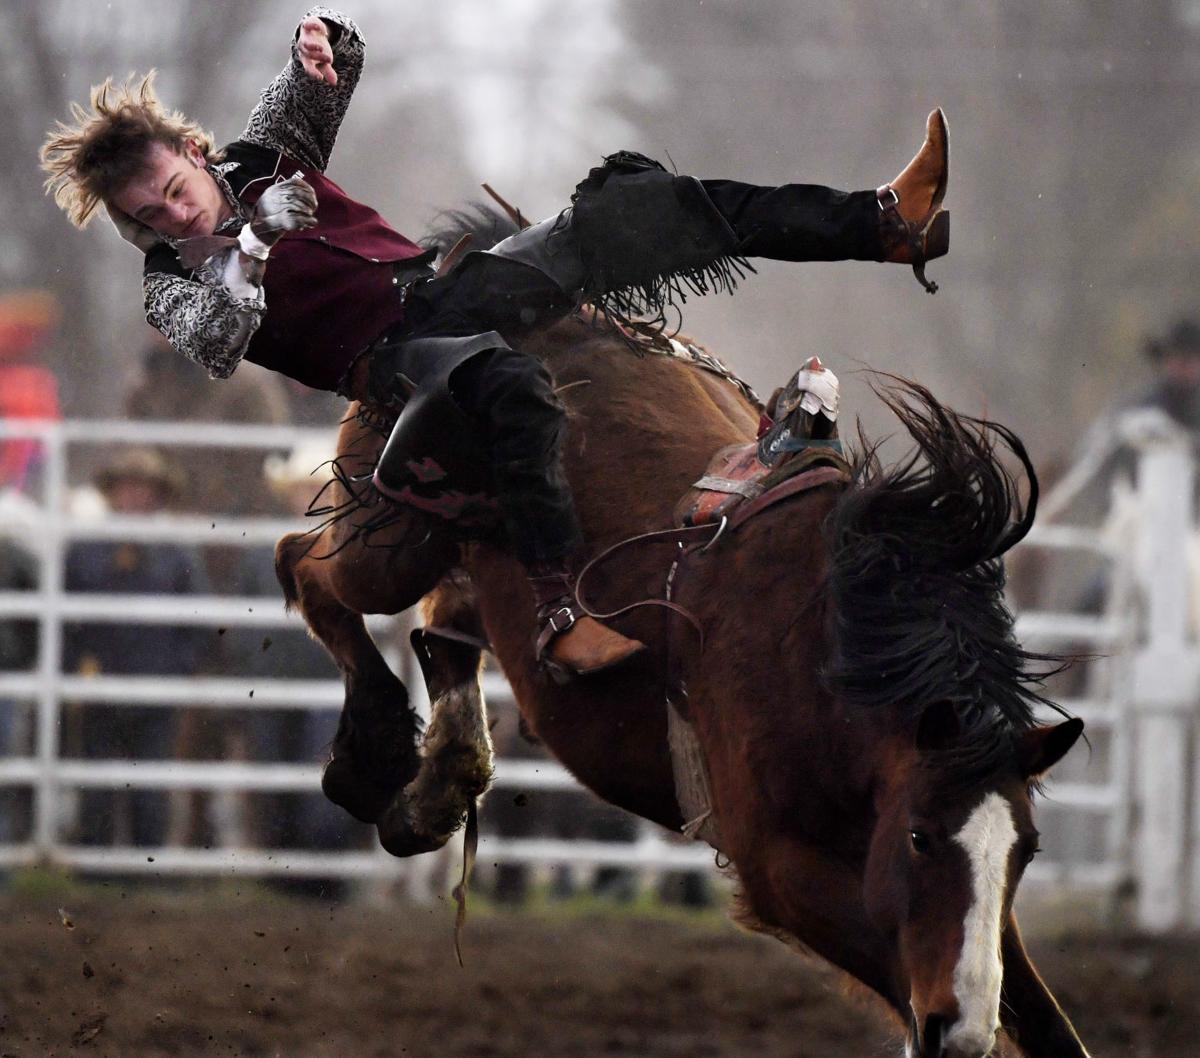 042719 rodeo-2-tm.jpg